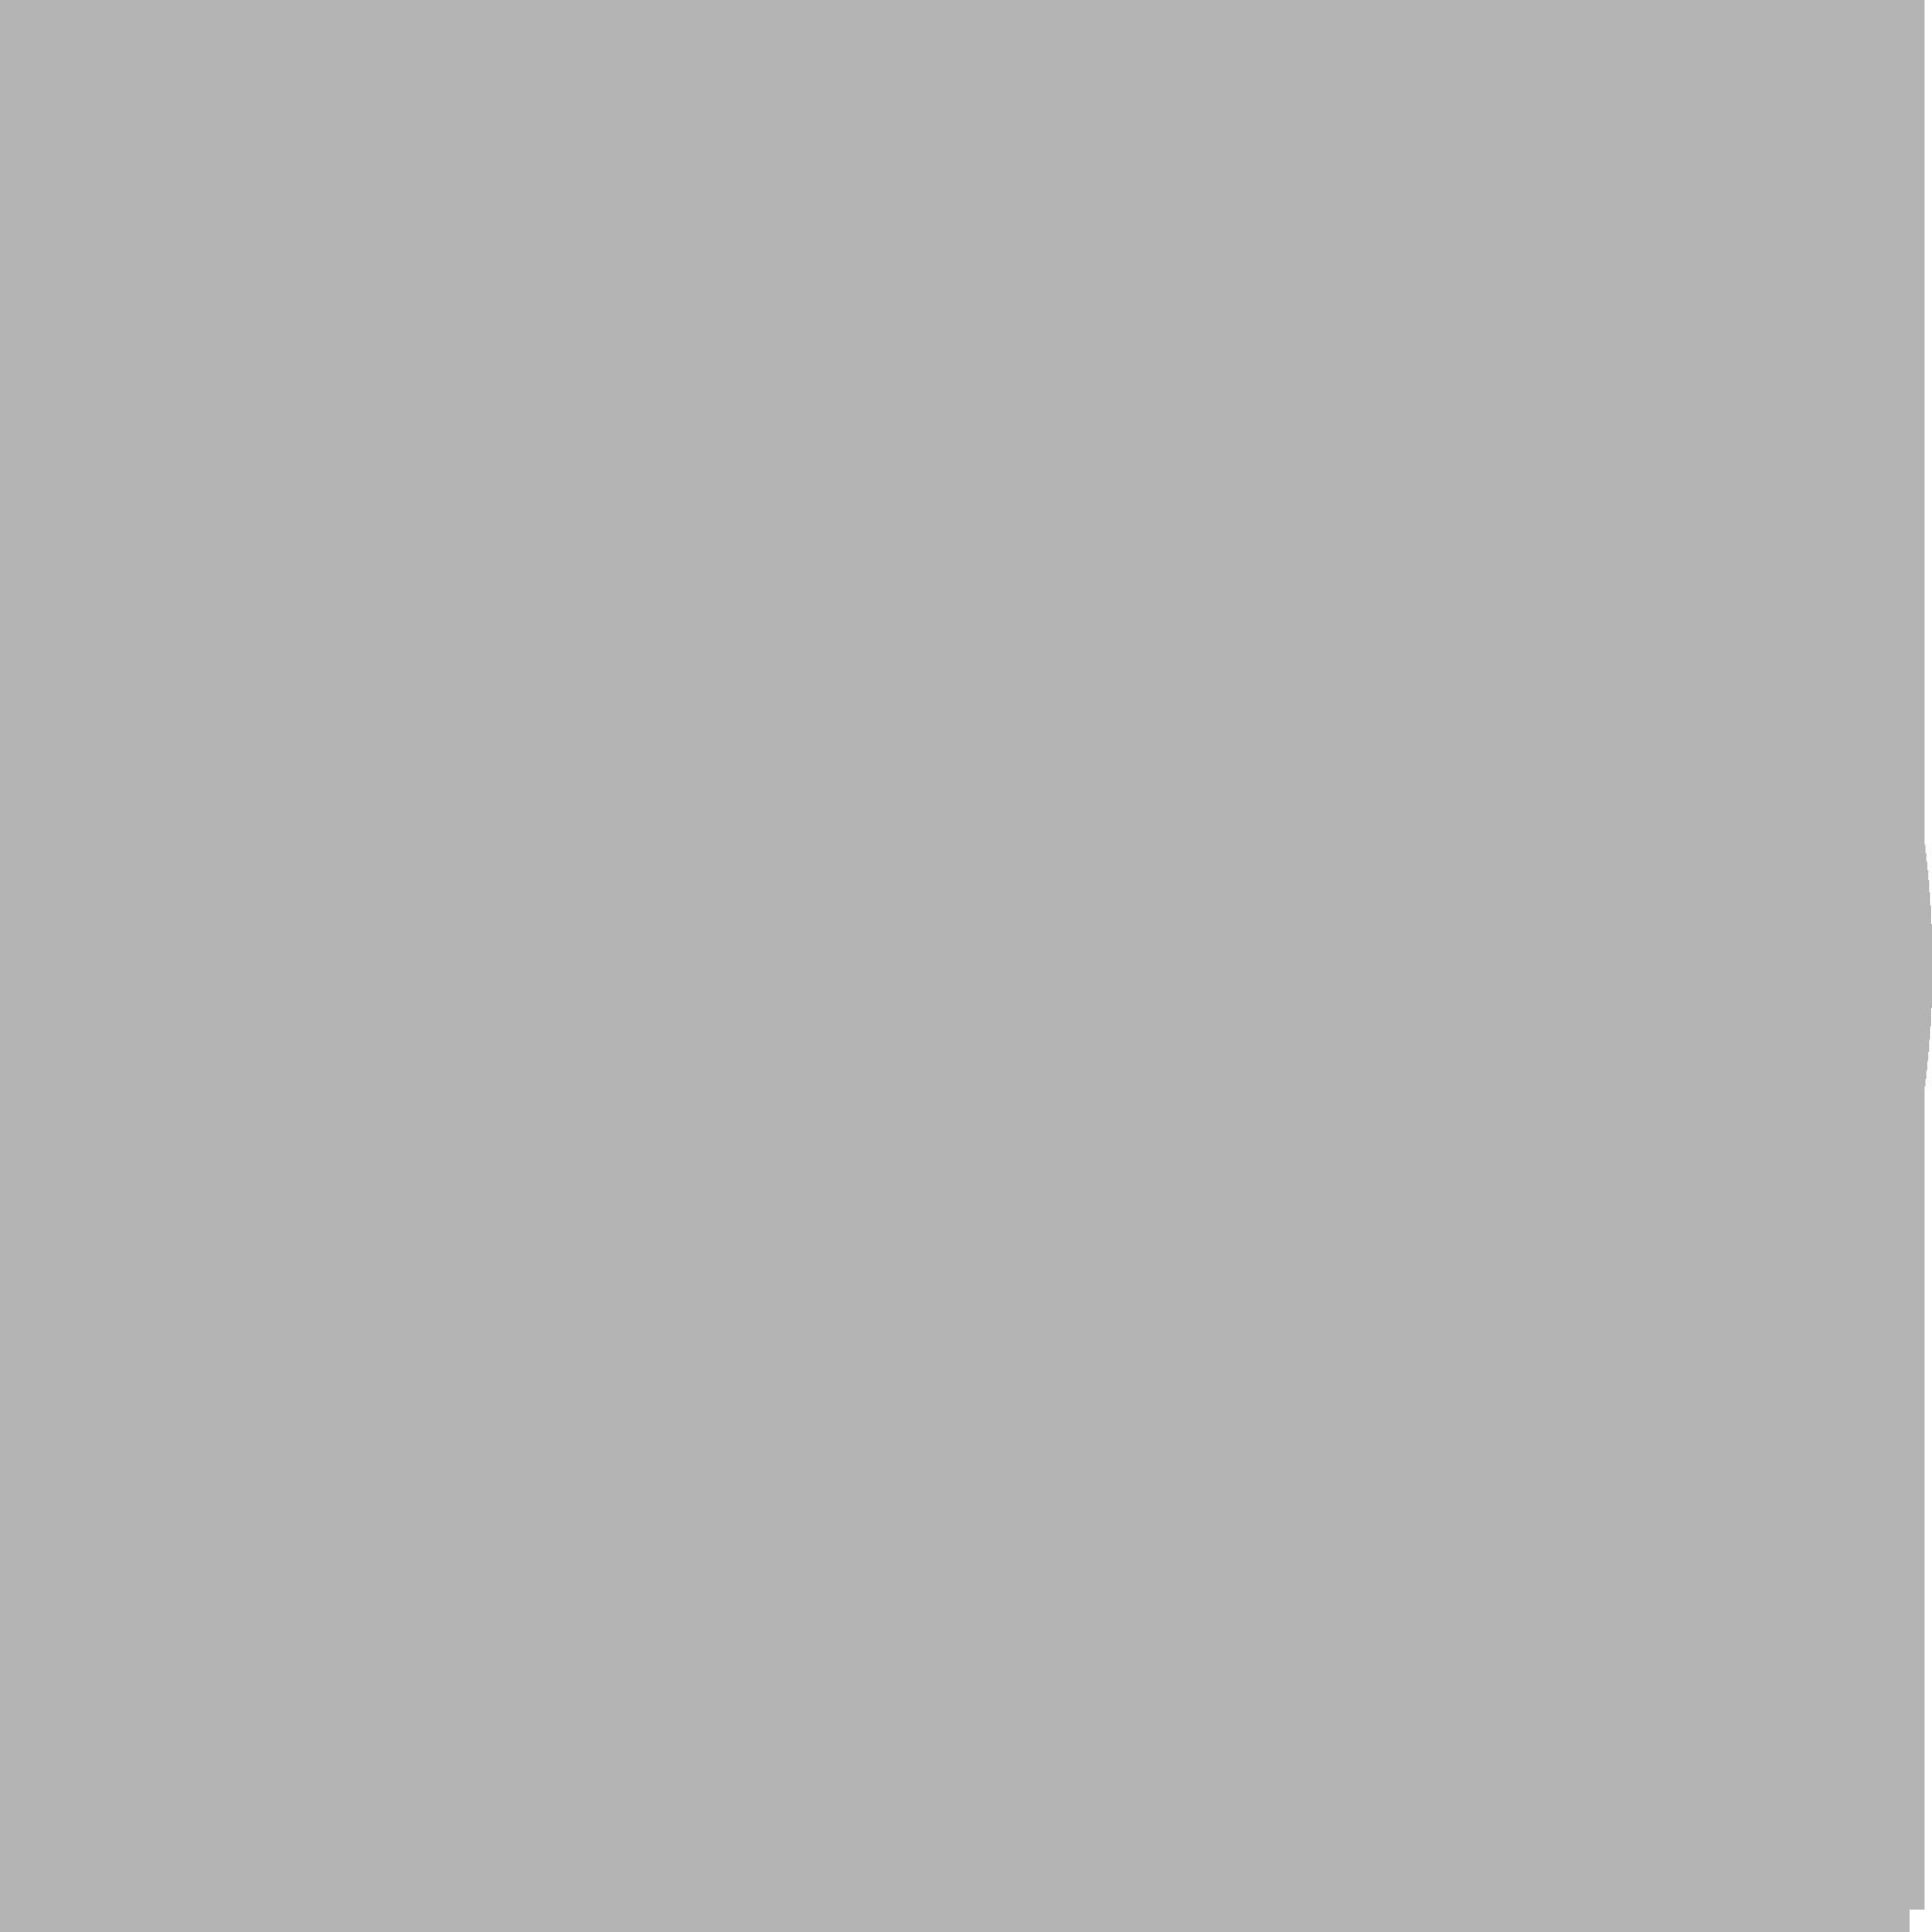 Logo Behance PNG - 114117